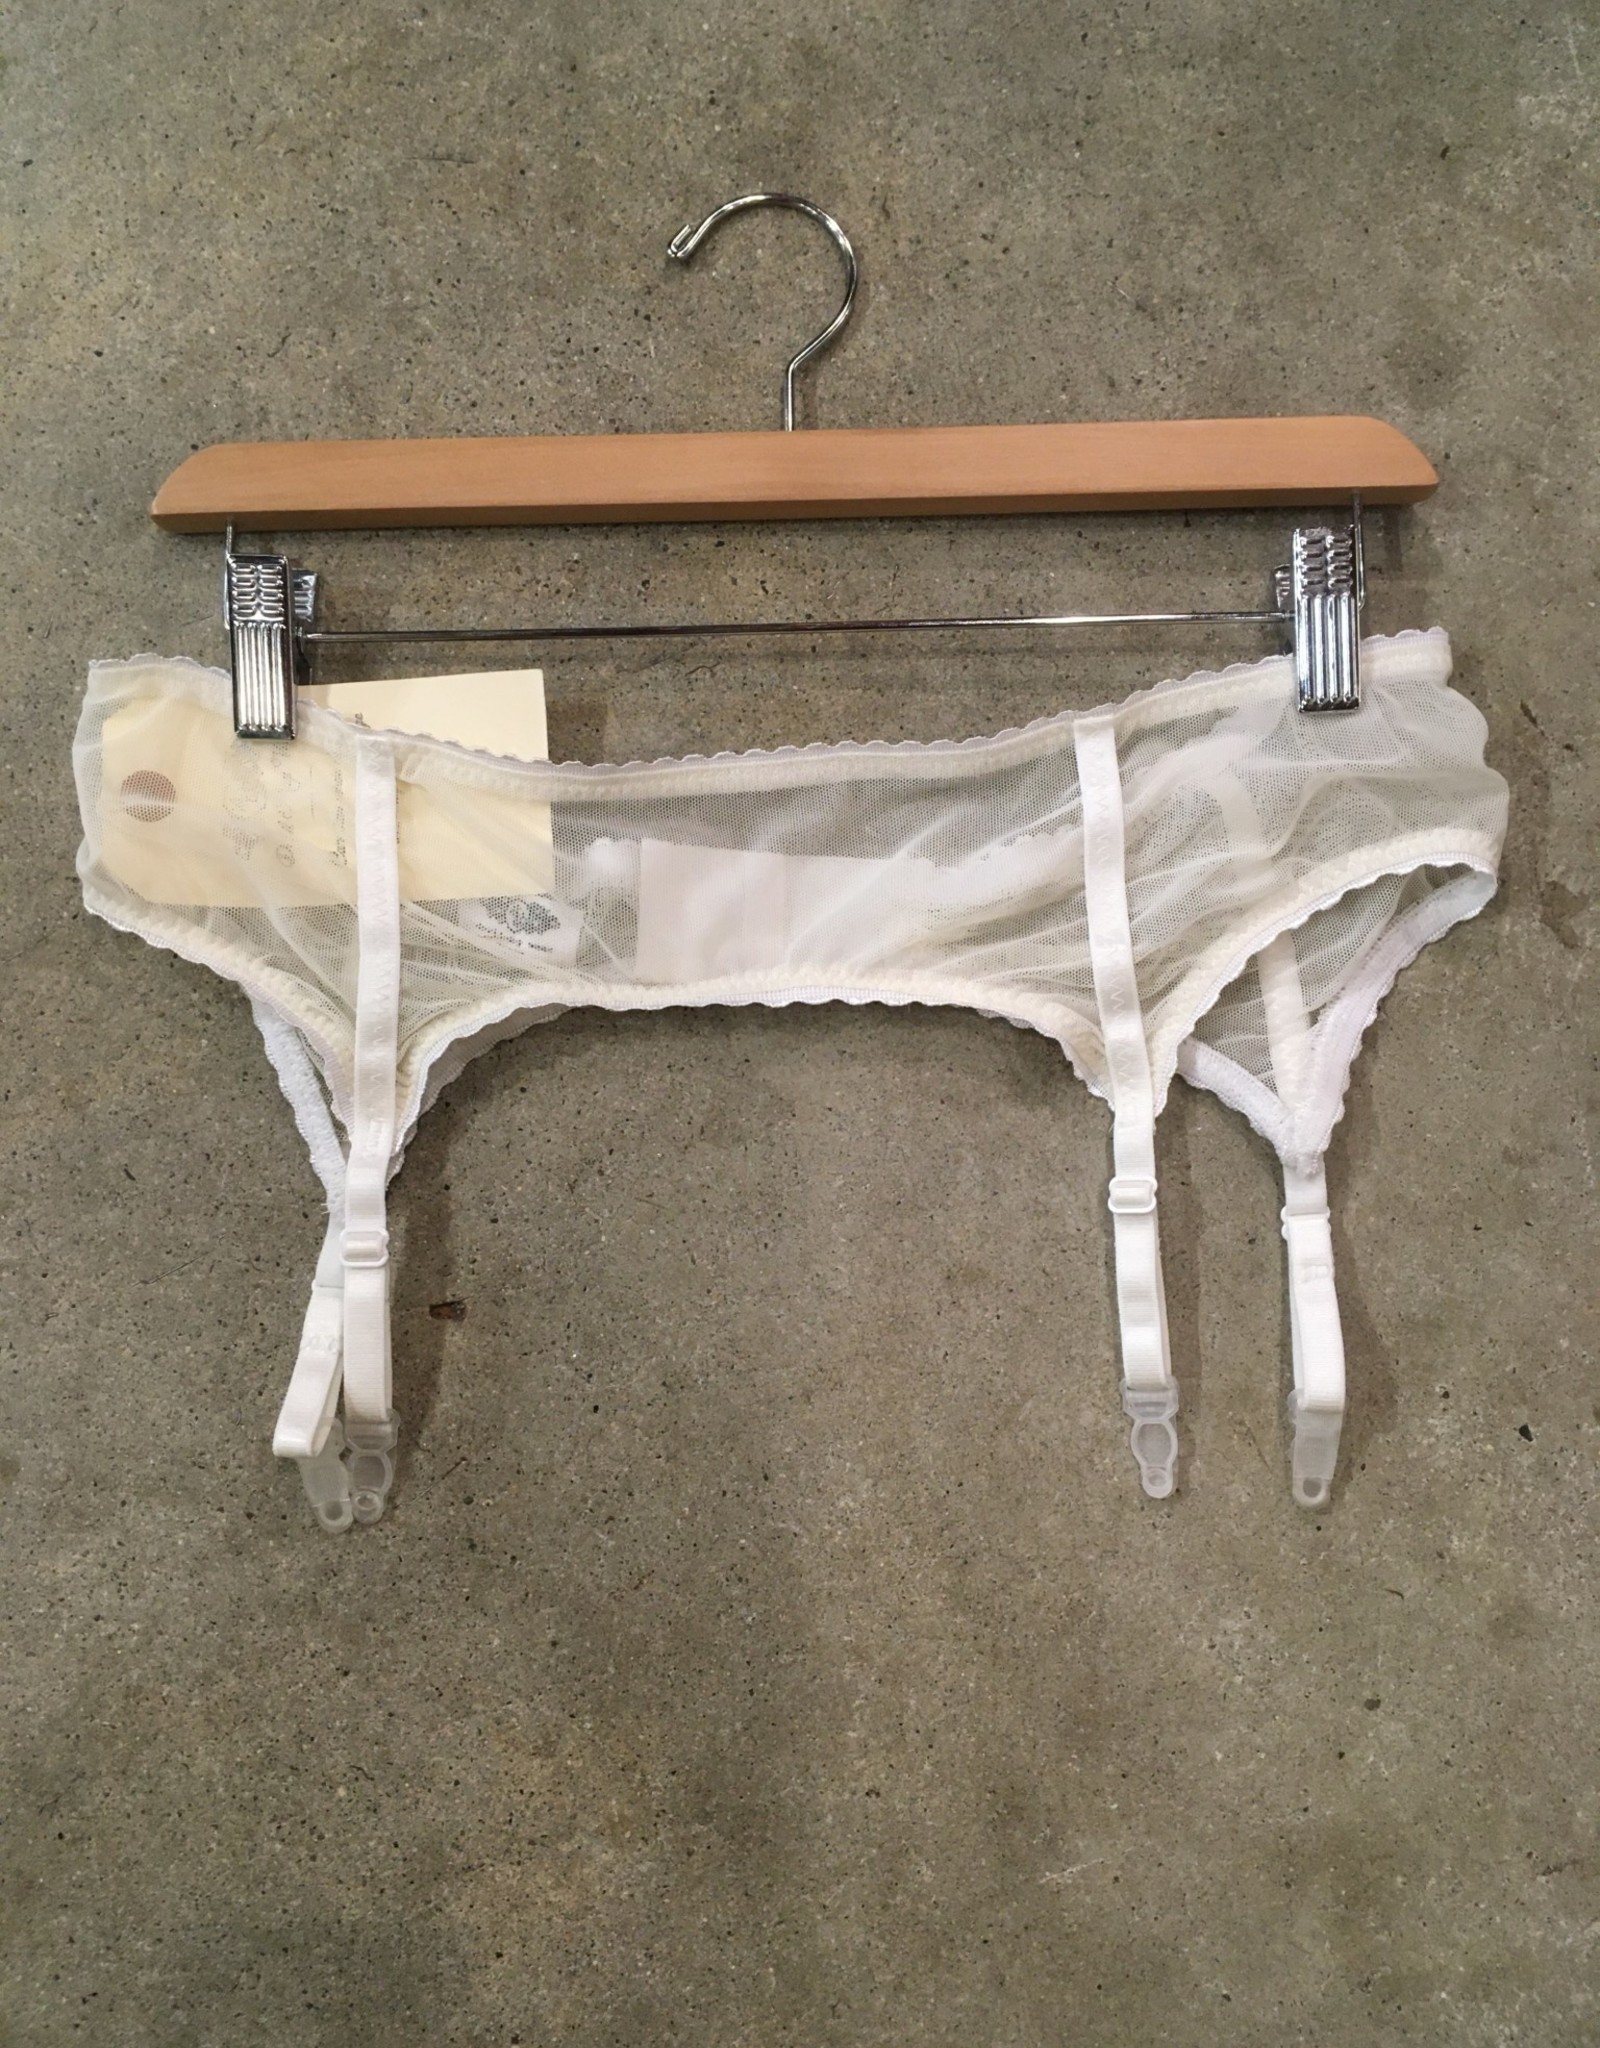 Devil May Wear Lola Garter Belt. 100% Nylon Mesh. Bra clasp closure. Low Rise fit. Cream/Cream